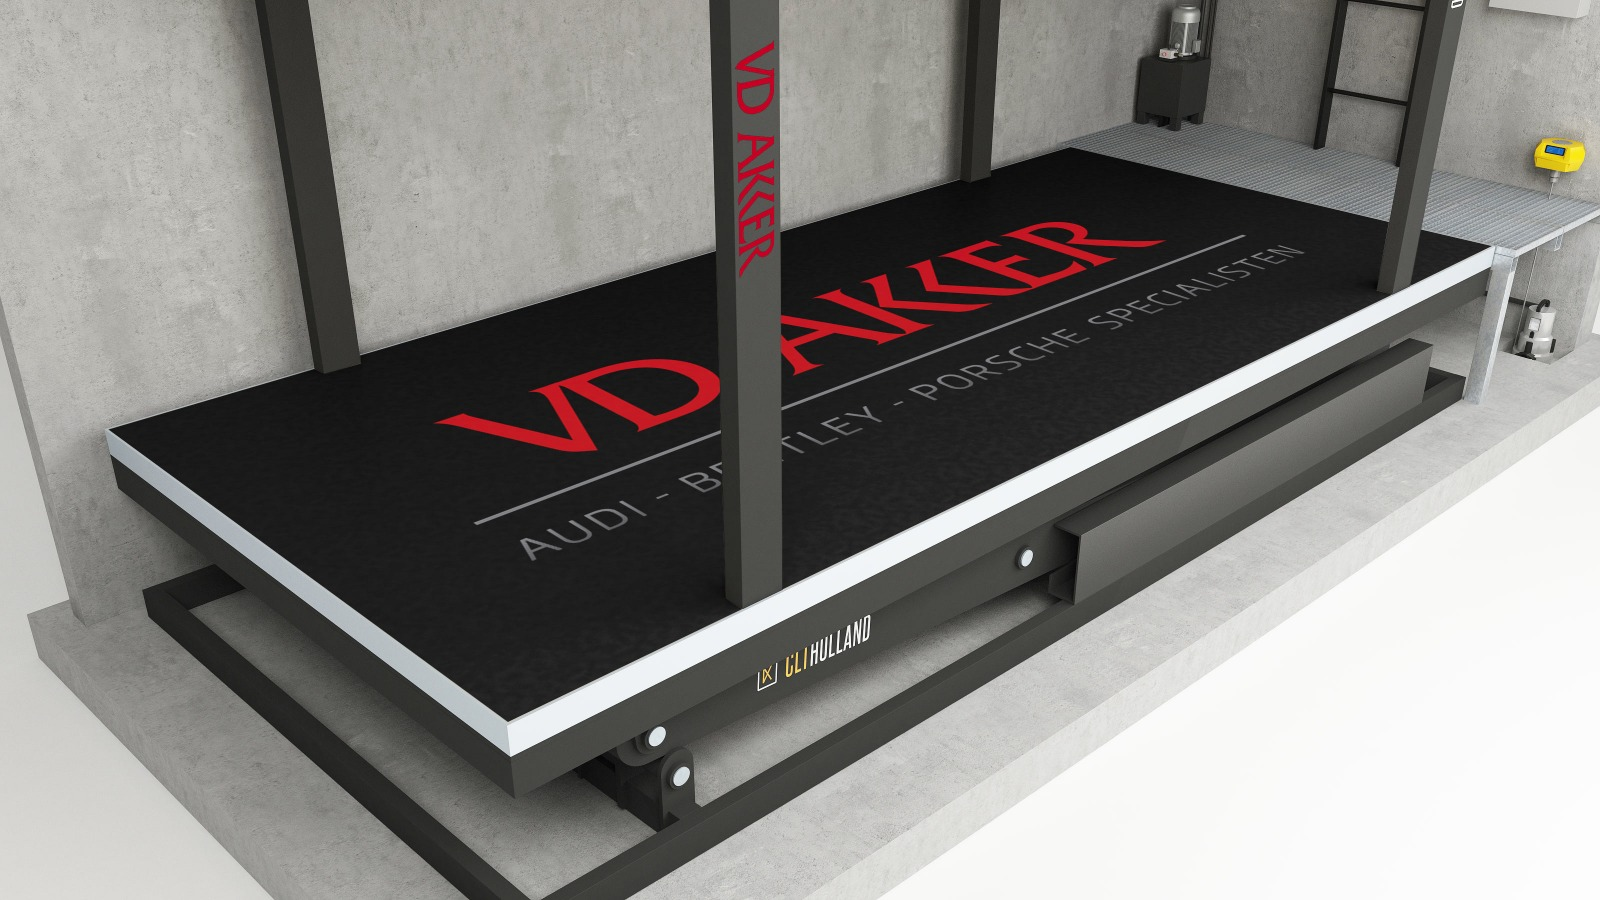 CLT Holland - Down Parker - Vloer geprint met logo VD Akker